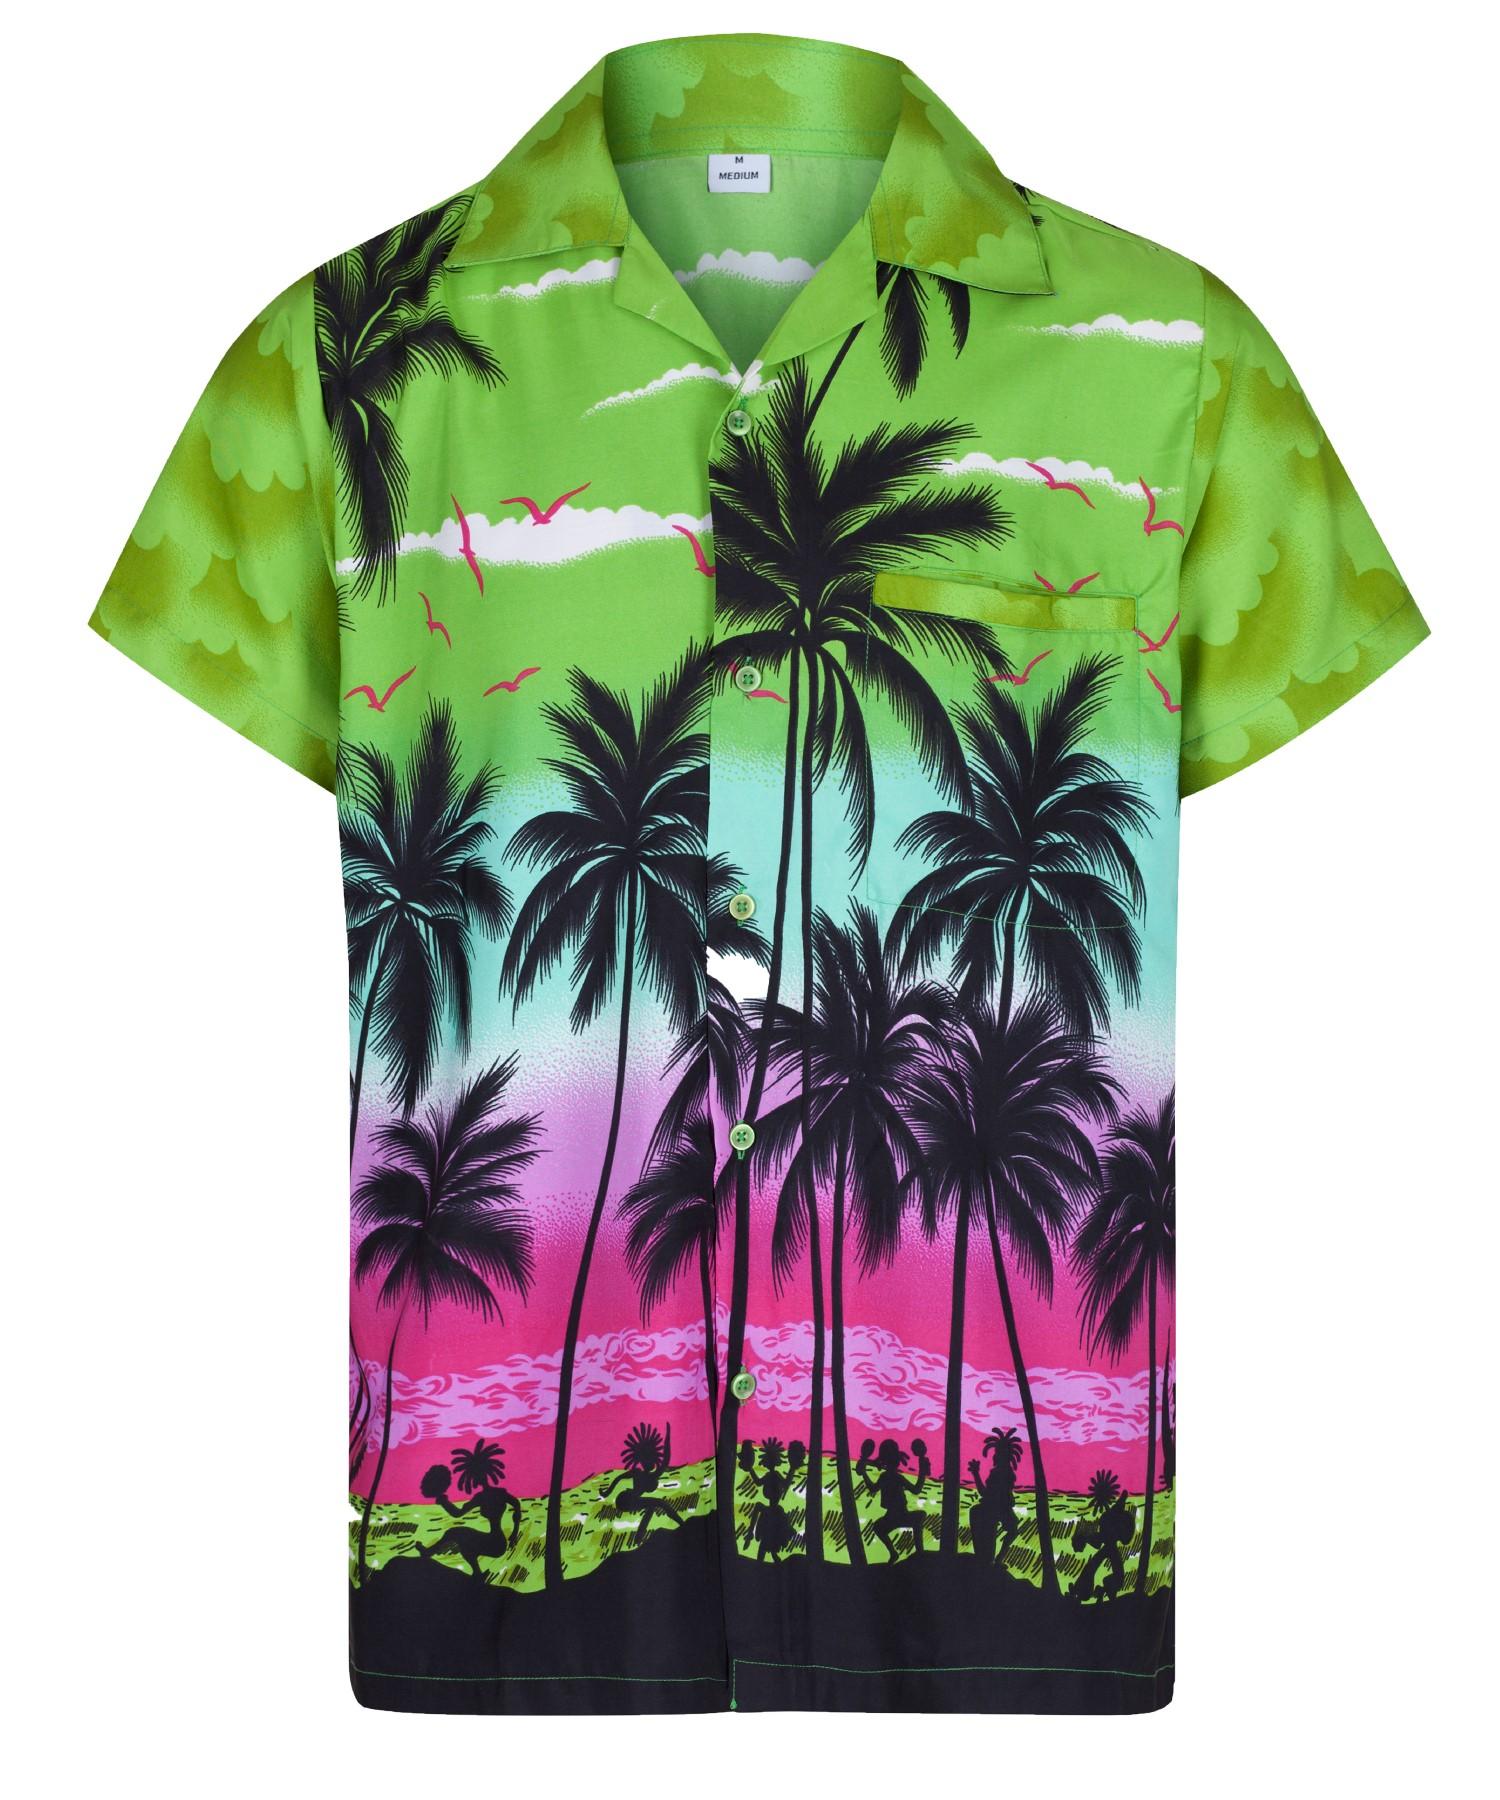 Hombre-Camisa-hawaiana-Aloha-Hawai-Tema-Fiesta-Camisa-Vacaciones-Playa-Disfraz